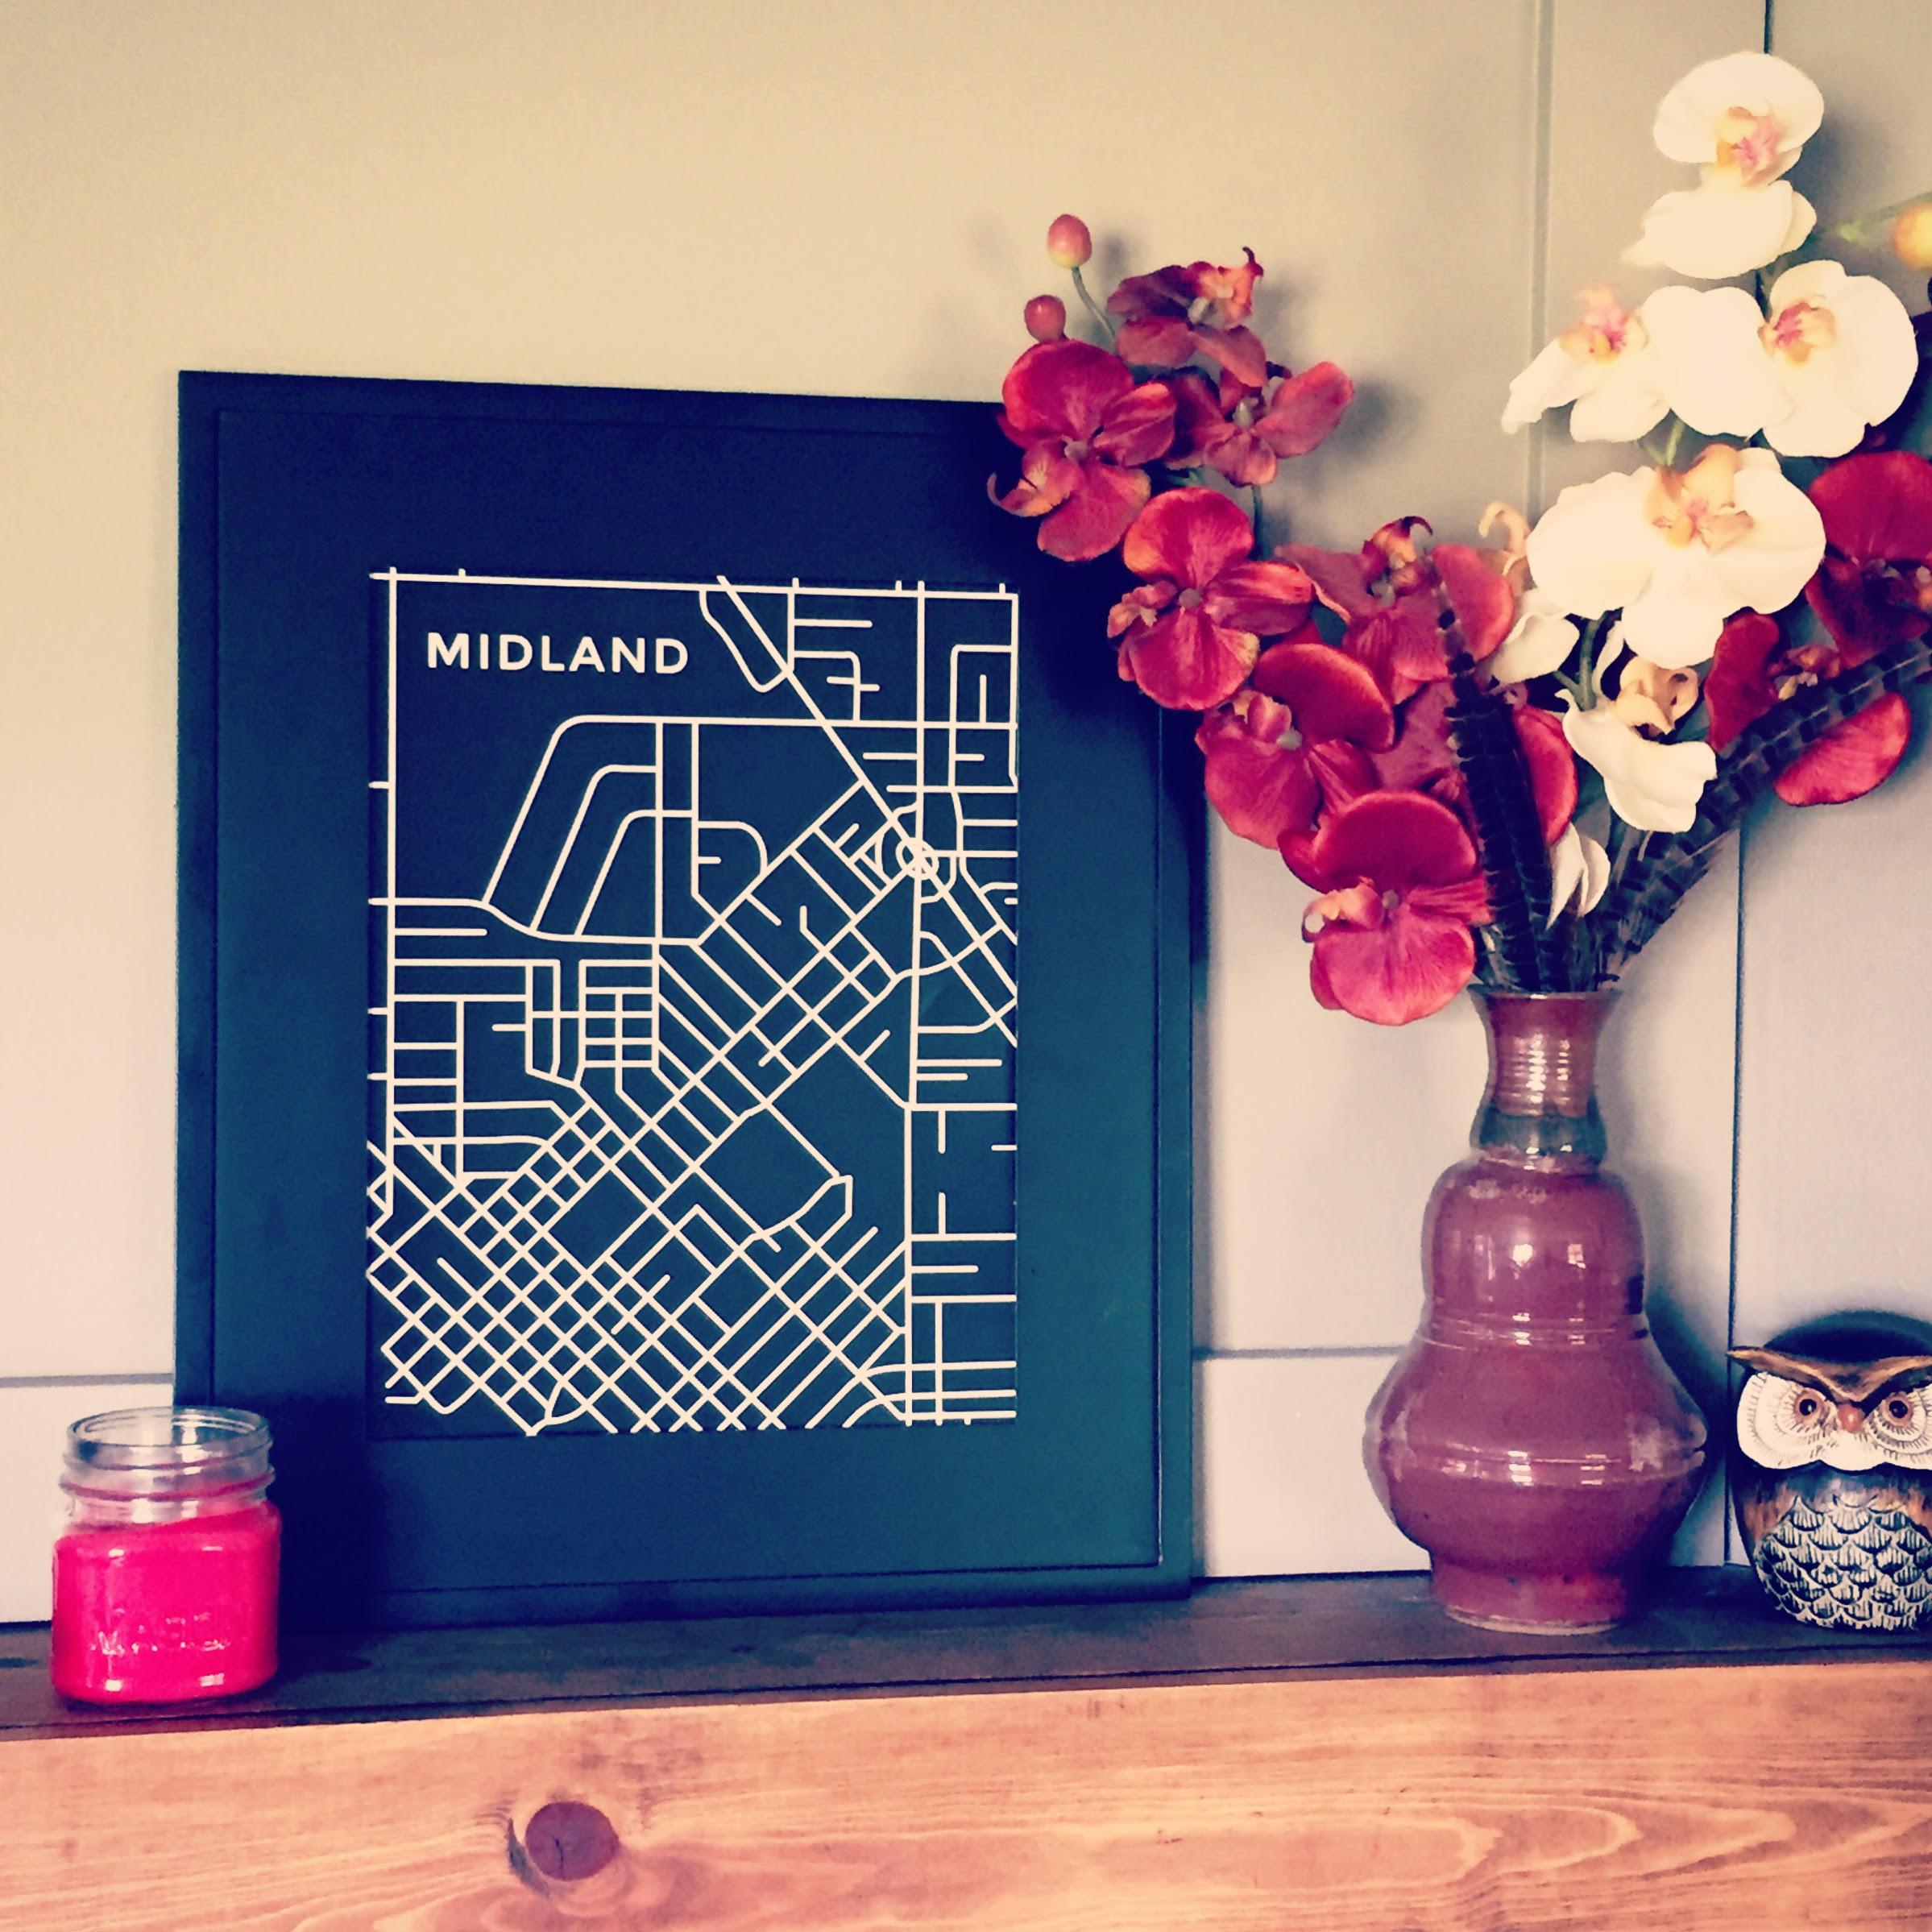 Midland Map, Bringing home Midland print, Art Print, Home decor, Map, Hometown love, Michigan, MI Meet me in midtown, Midland Circle, Uptown Midland